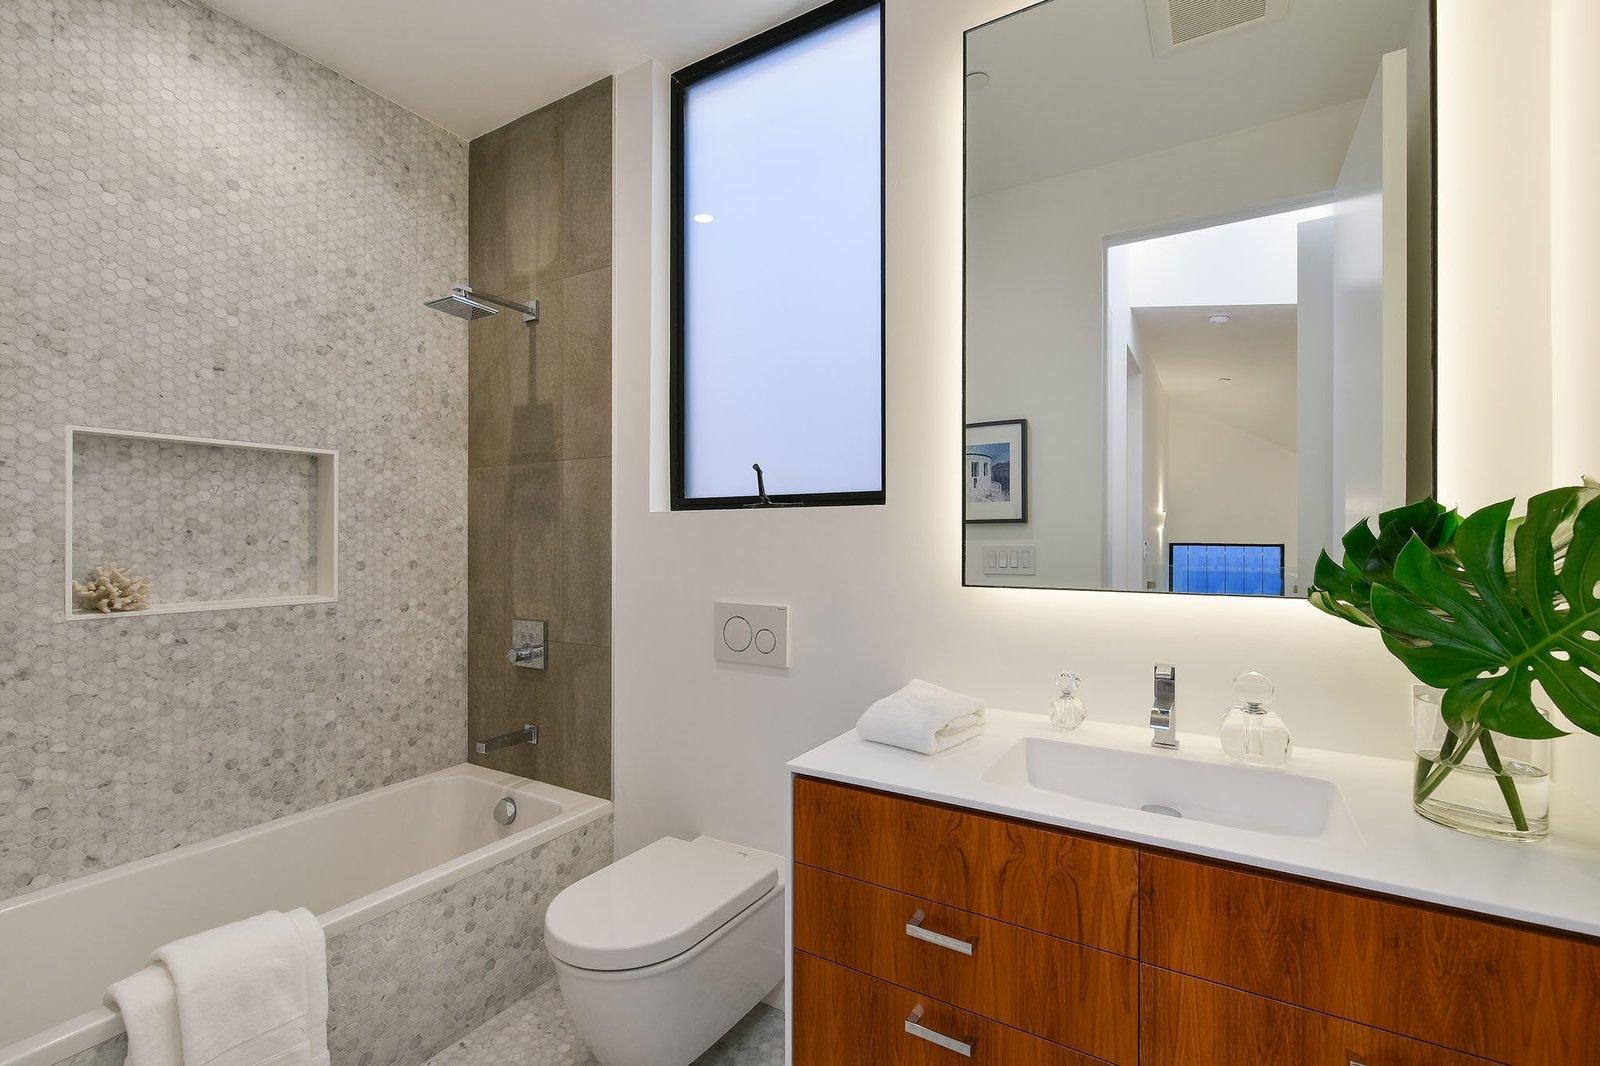 Bath Room  For Sale: 188 Quane Street